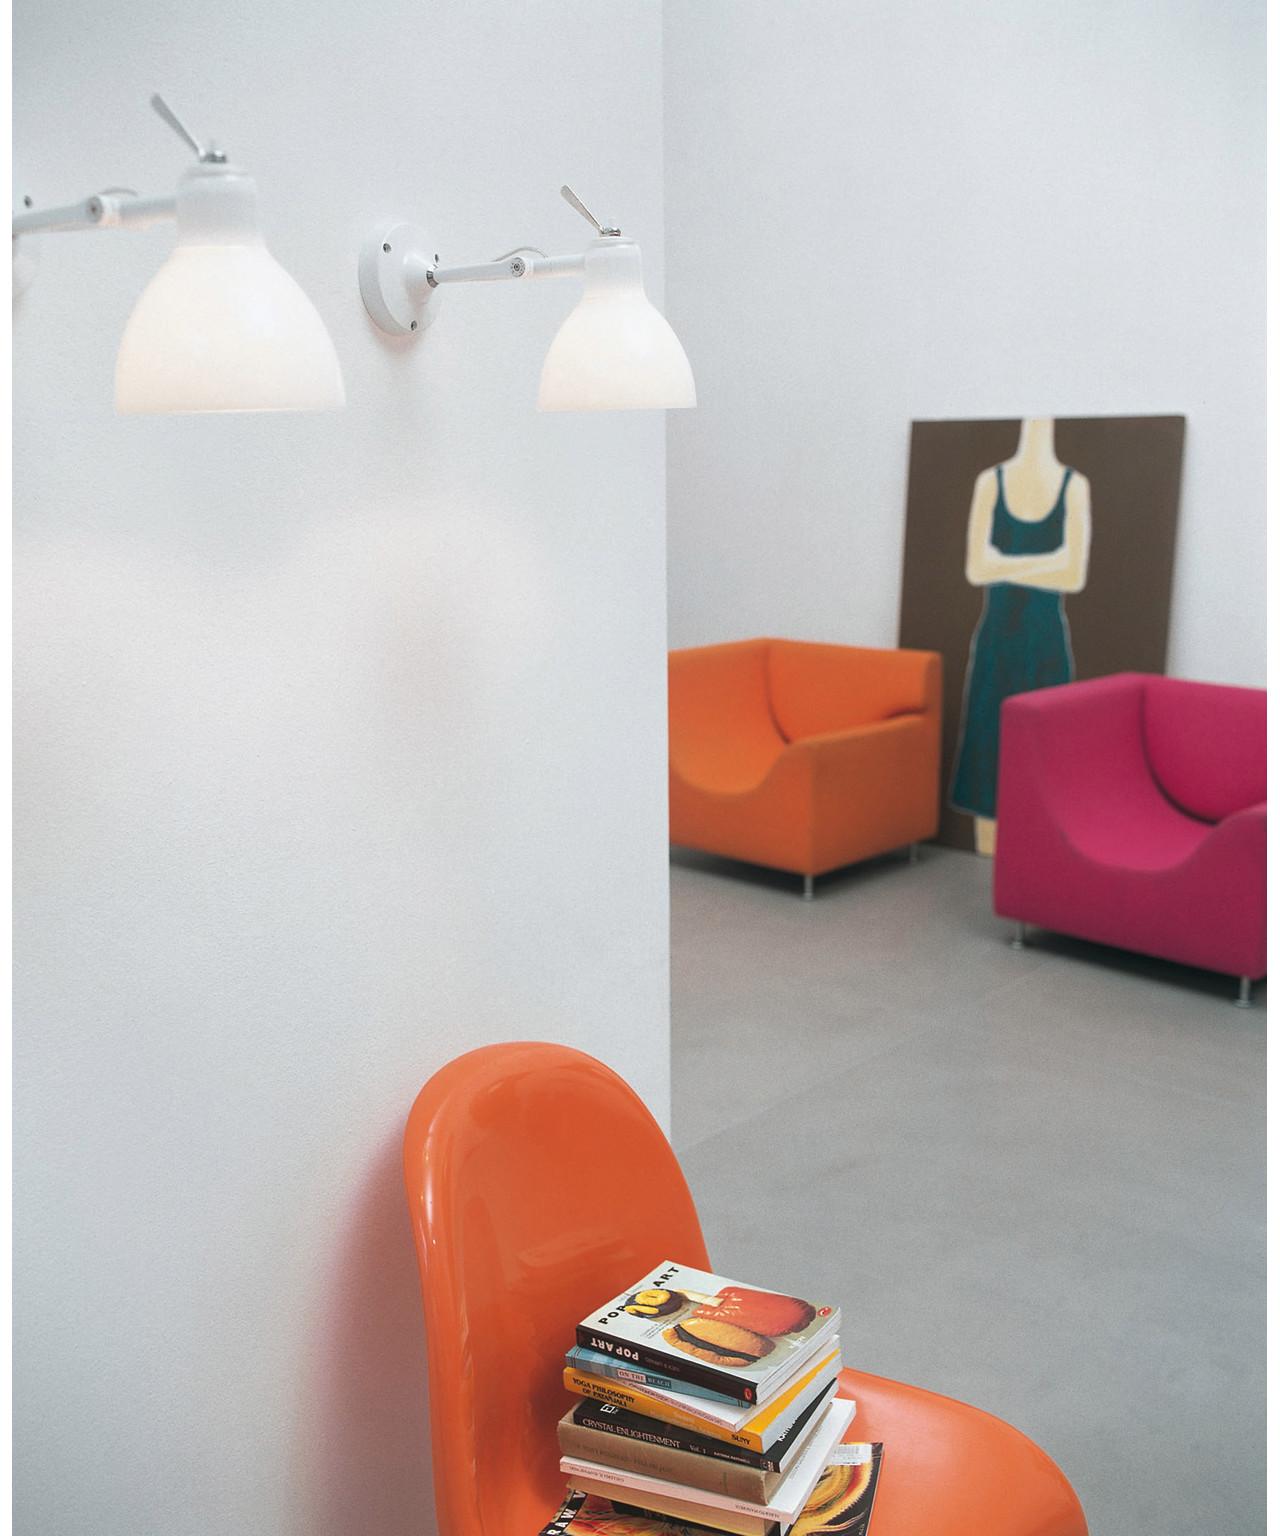 Image of Luxy H0 Væglampe/Loftlampe Hvid/Blank Hvid - Rotaliana (7609826)